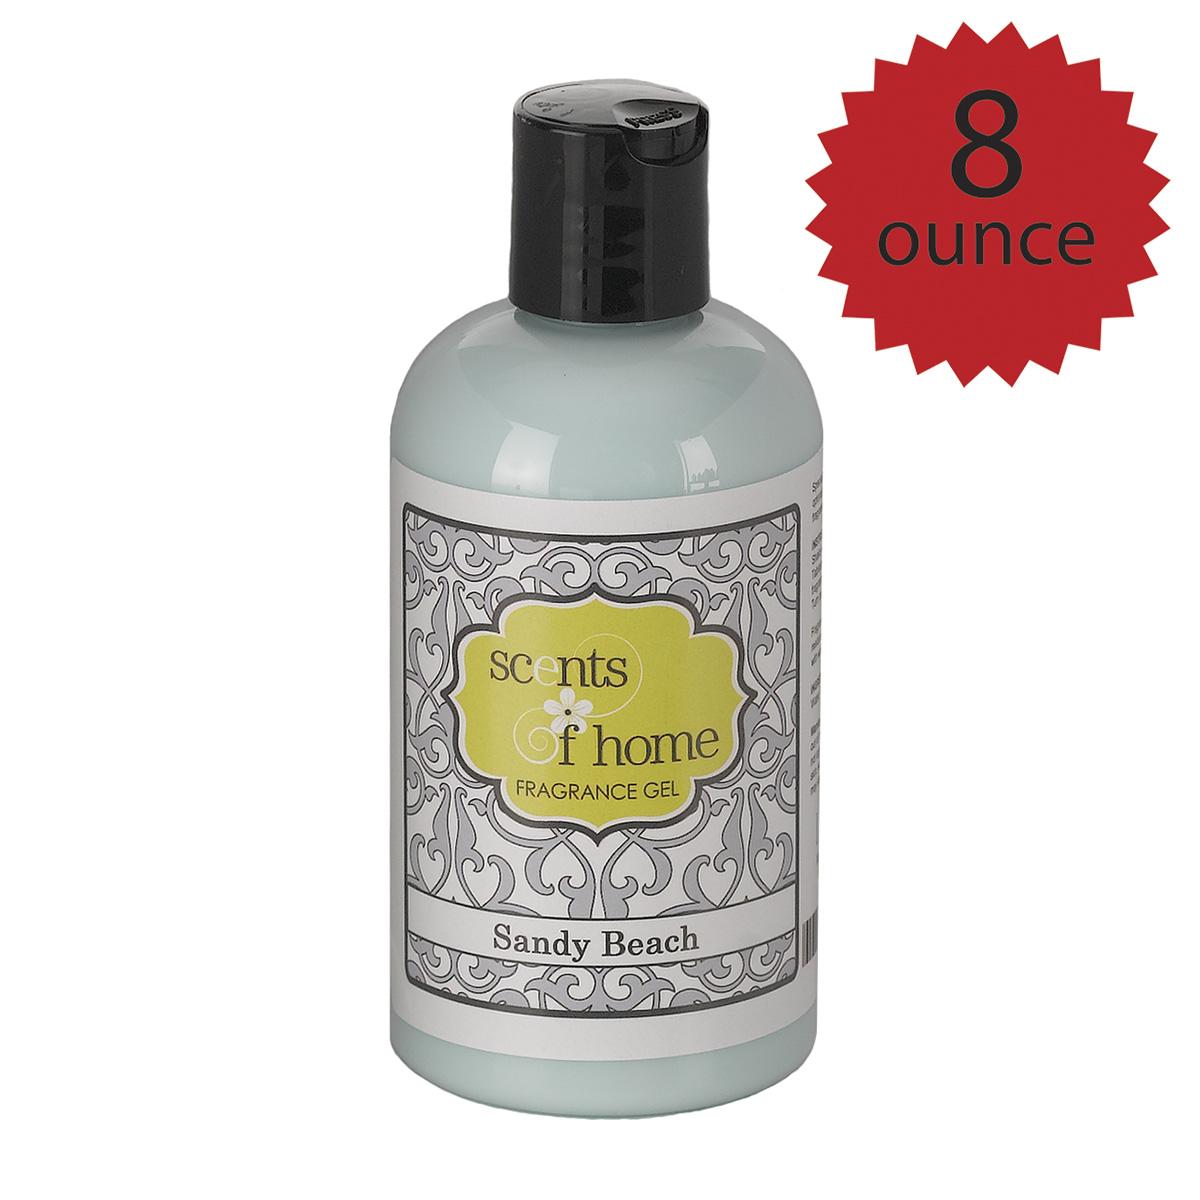 8 oz. Fragrance Gel - Sandy Beach